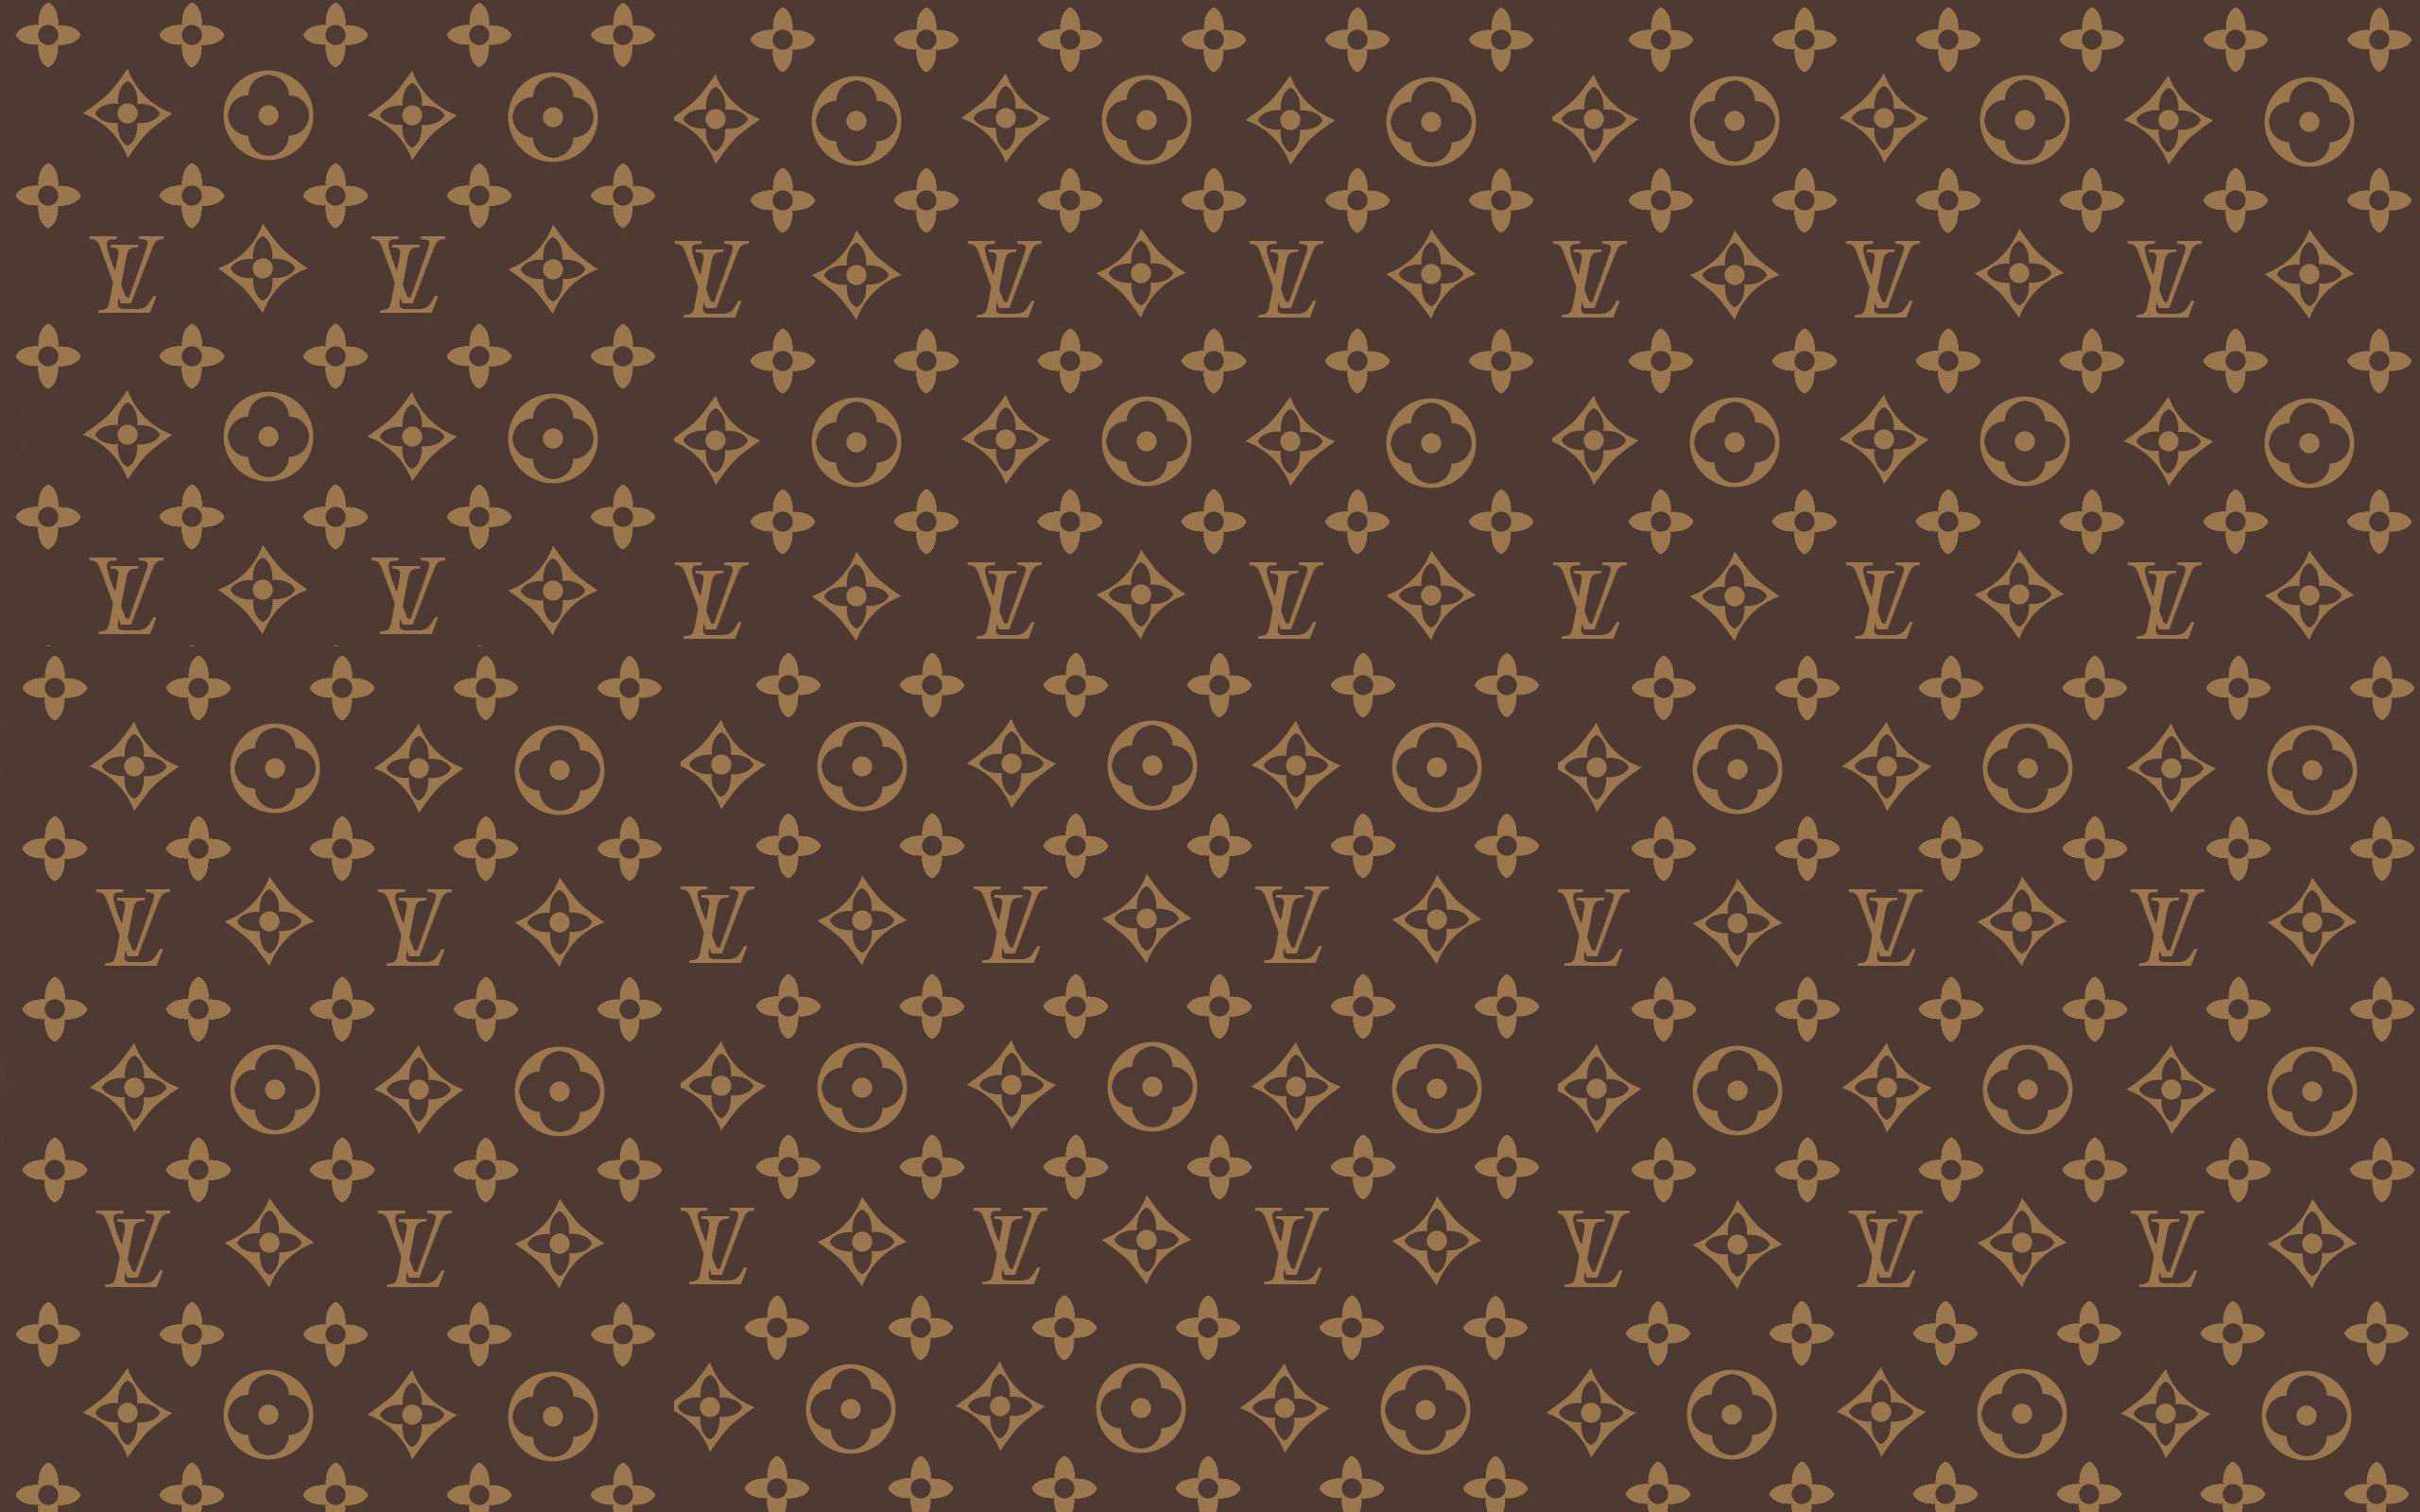 College wallpaper | 1366x768 | #71044